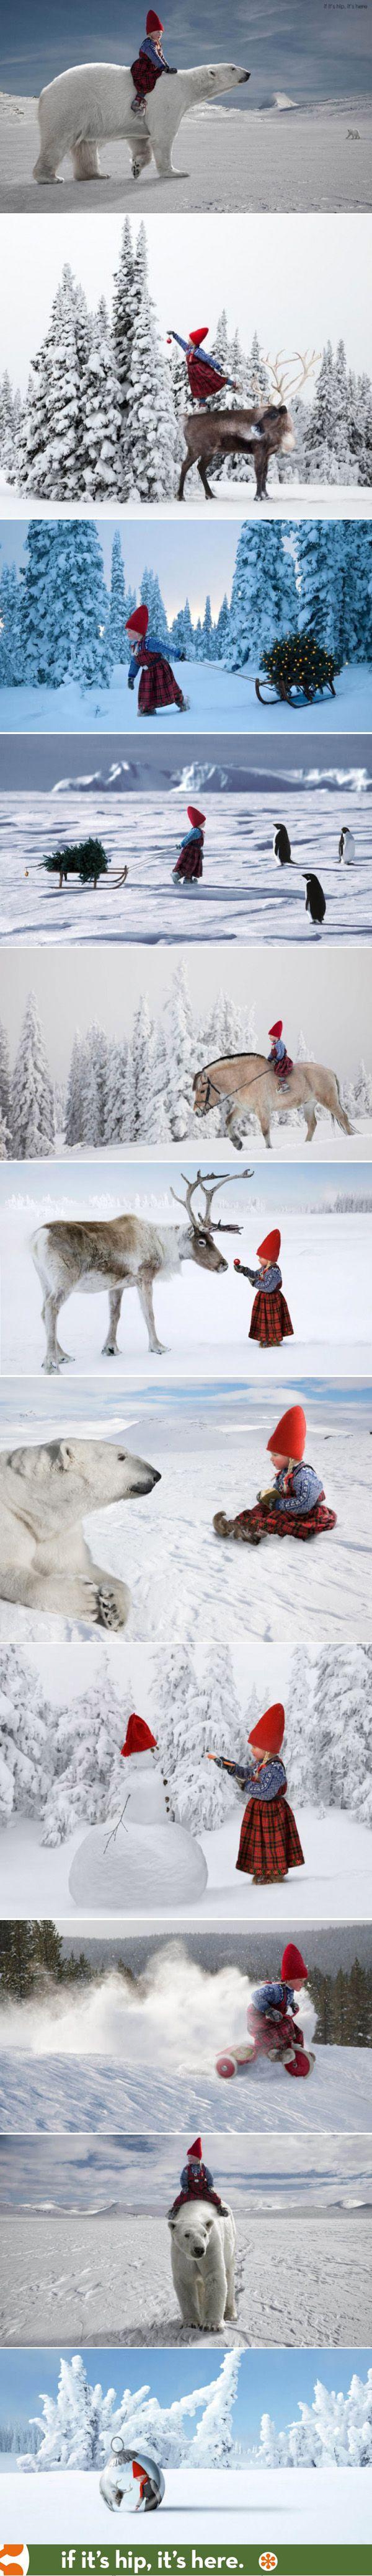 Enchanting Winter Magic photos of a Nordic Christmas   http://www.ifitshipitshere.com/winter-magic-spellbinding-photographs-by-per-breiehagen-for-italian-childrens-brand-chicco/